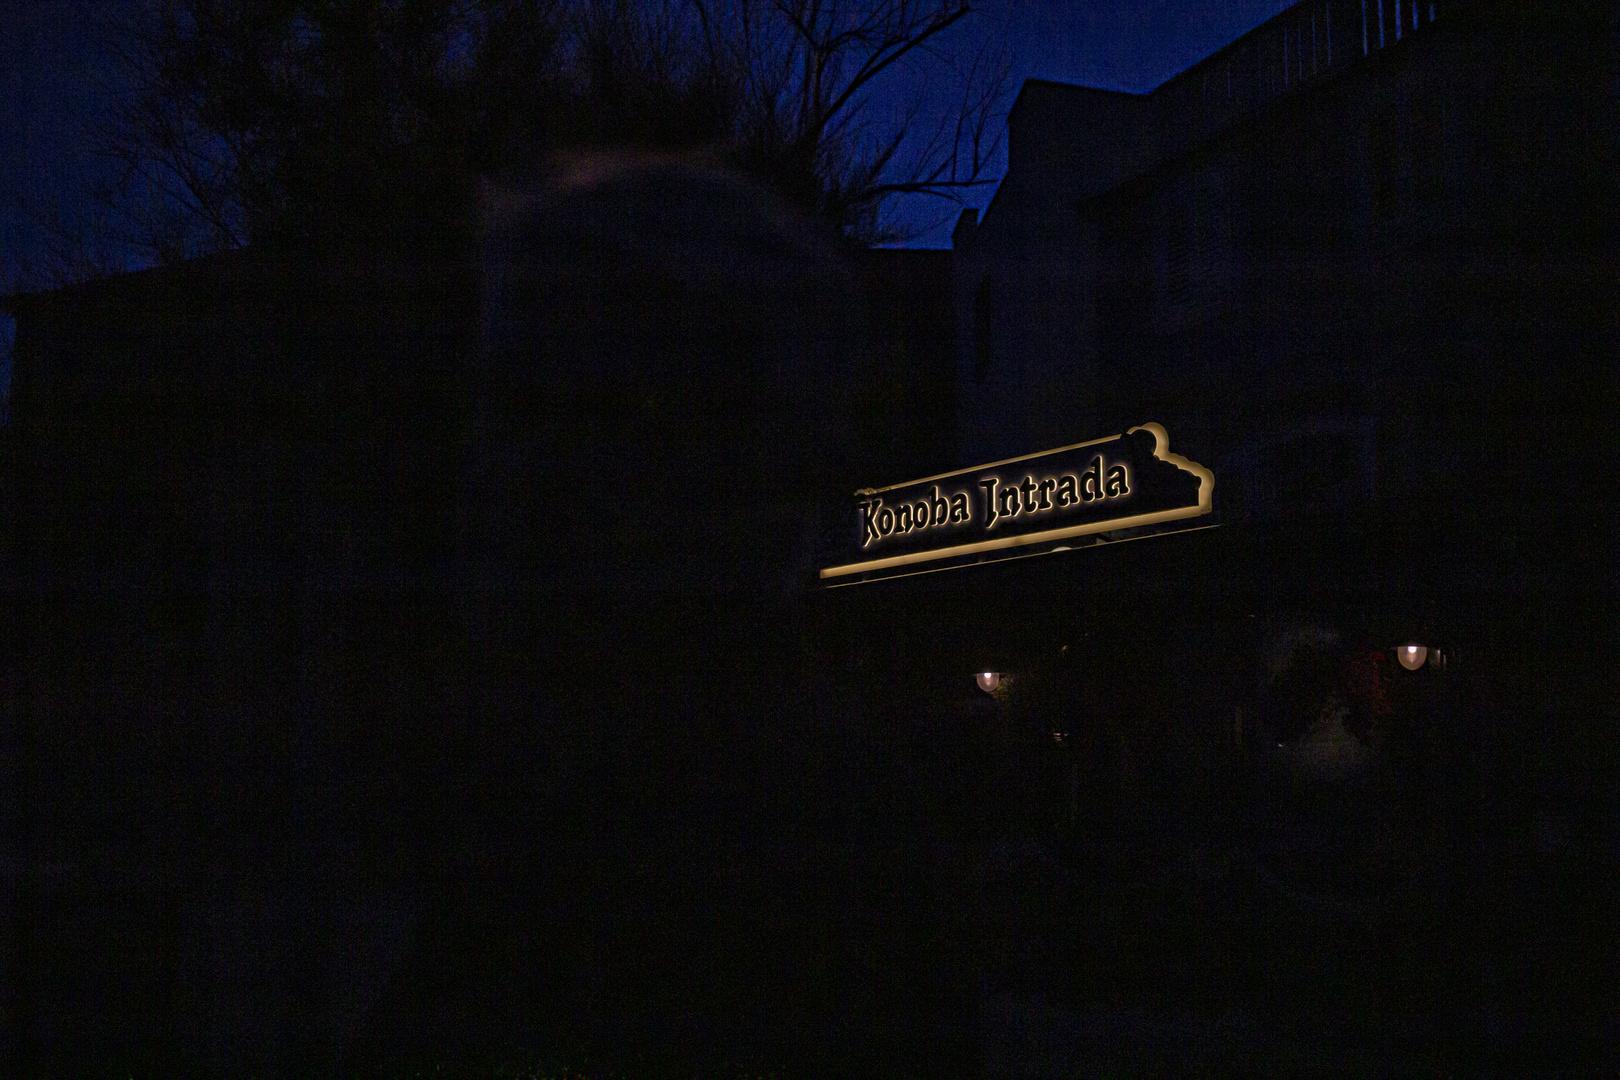 Kanoba Intrata nocturna